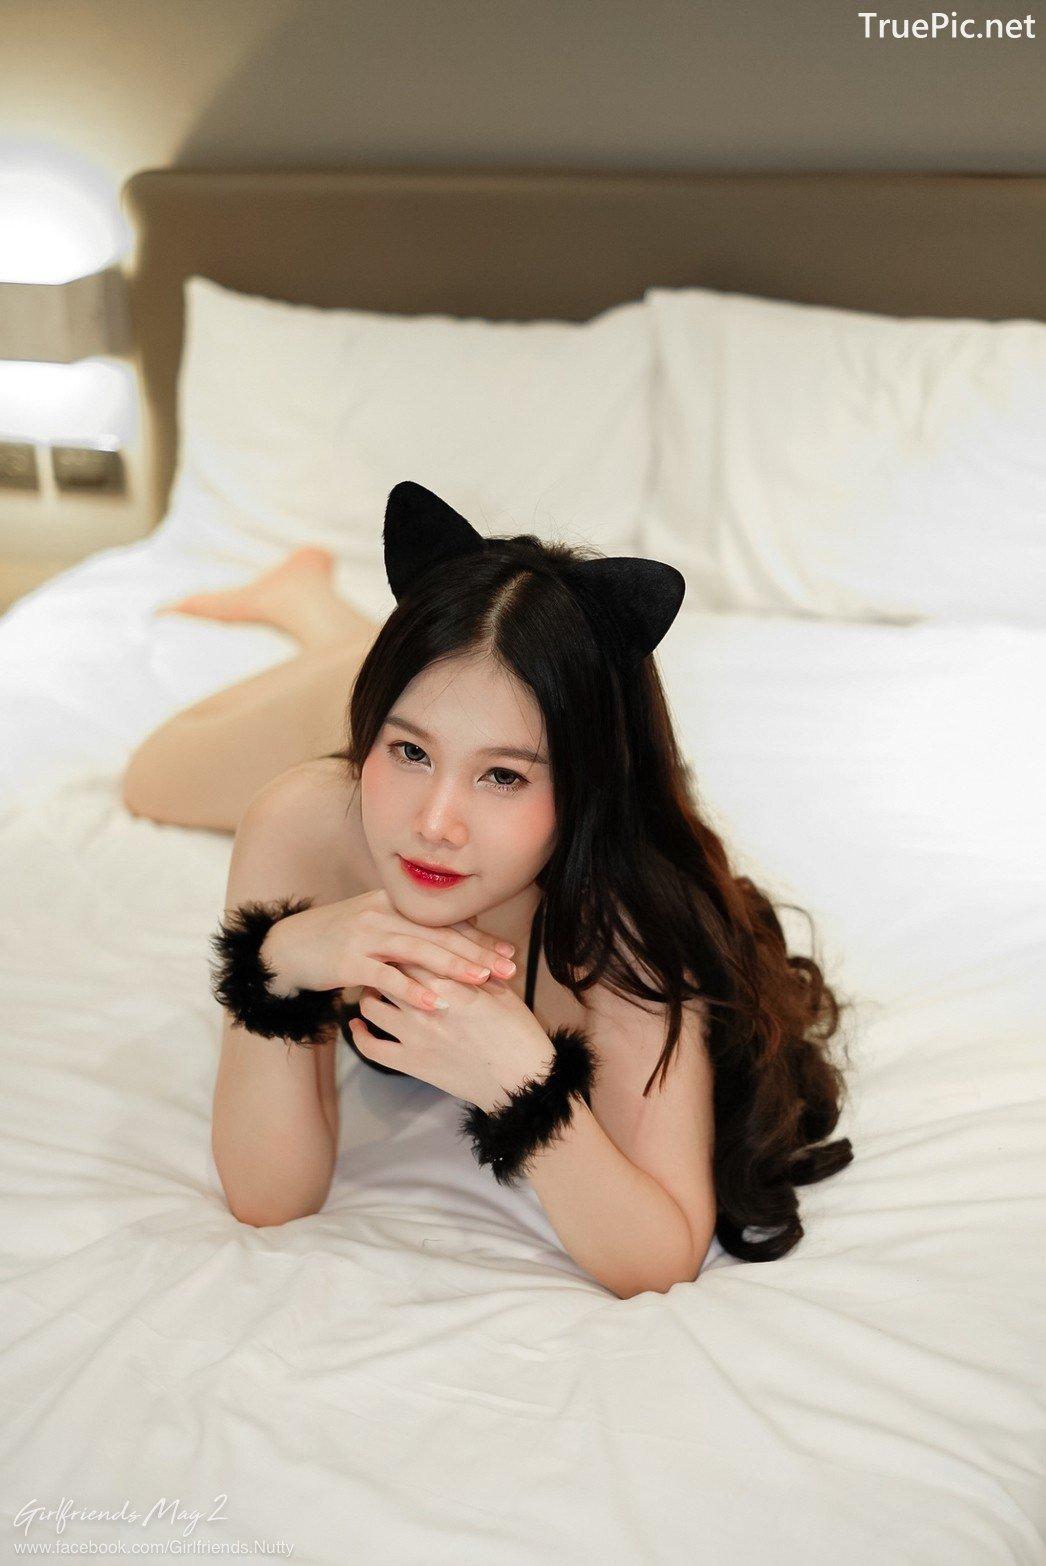 Image Thailand Model - Chanunshida Phuangsombut - Sexy Black Cat - TruePic.net - Picture-1